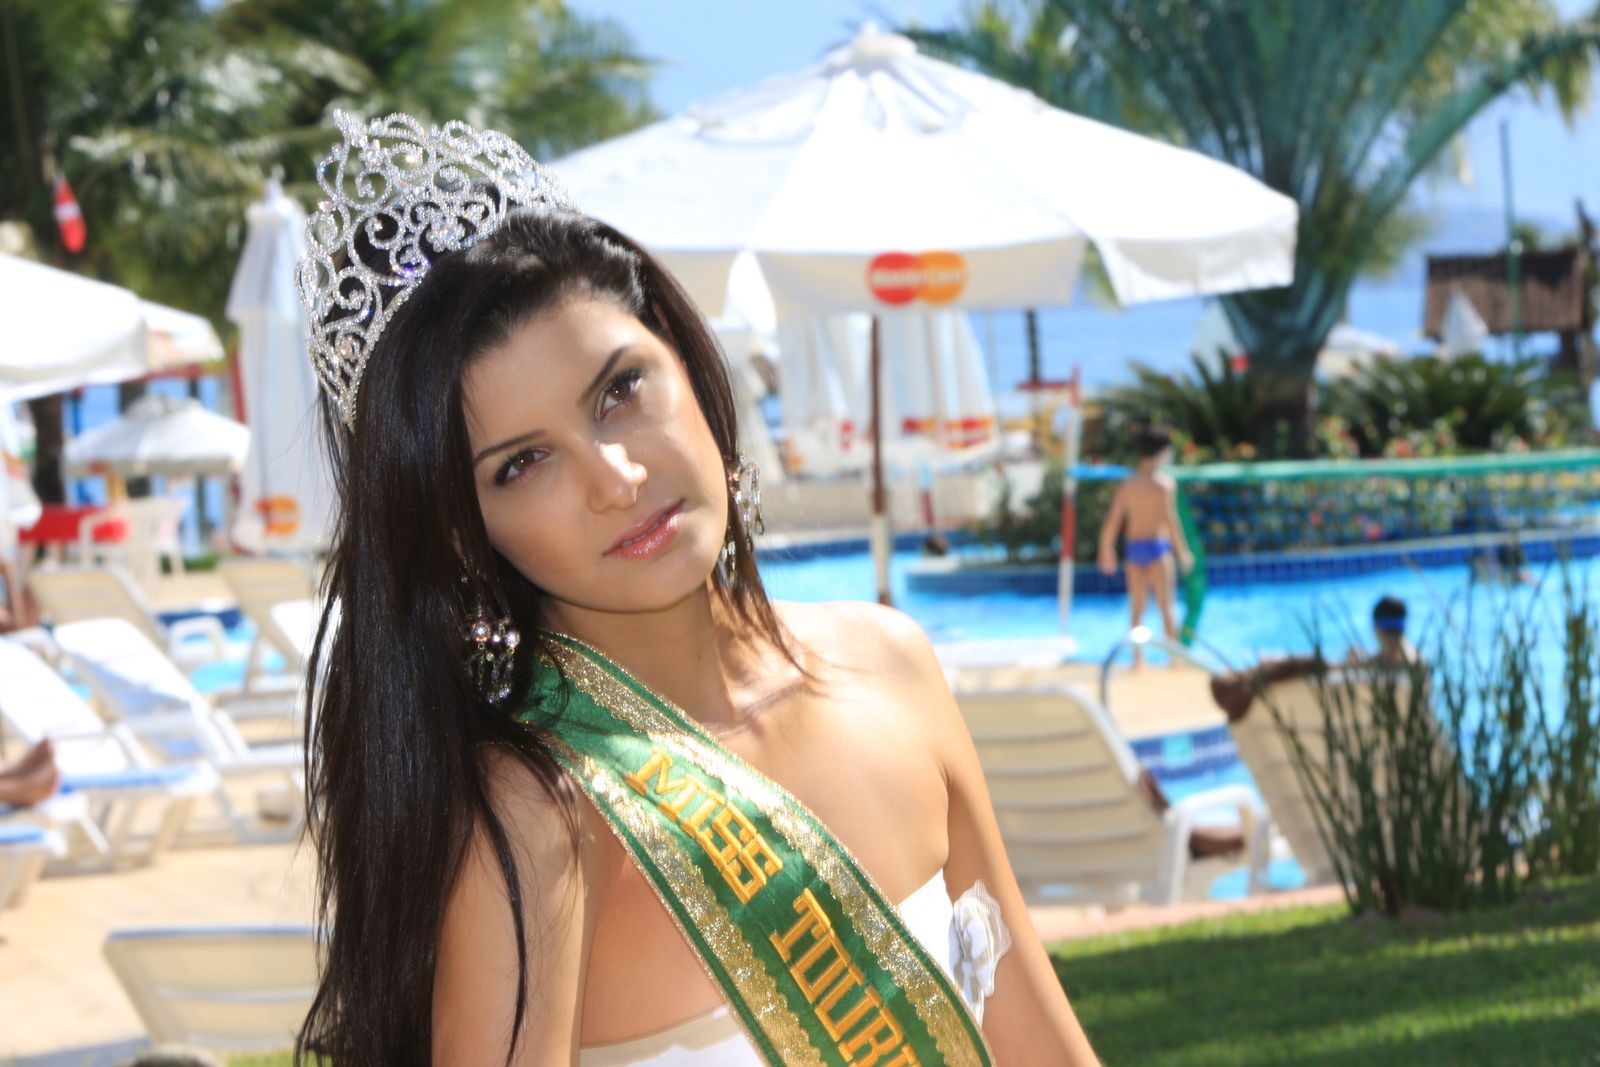 vivian noronha, rainha hispanoamericana 2008. suplente. - Página 2 Btmdxoak